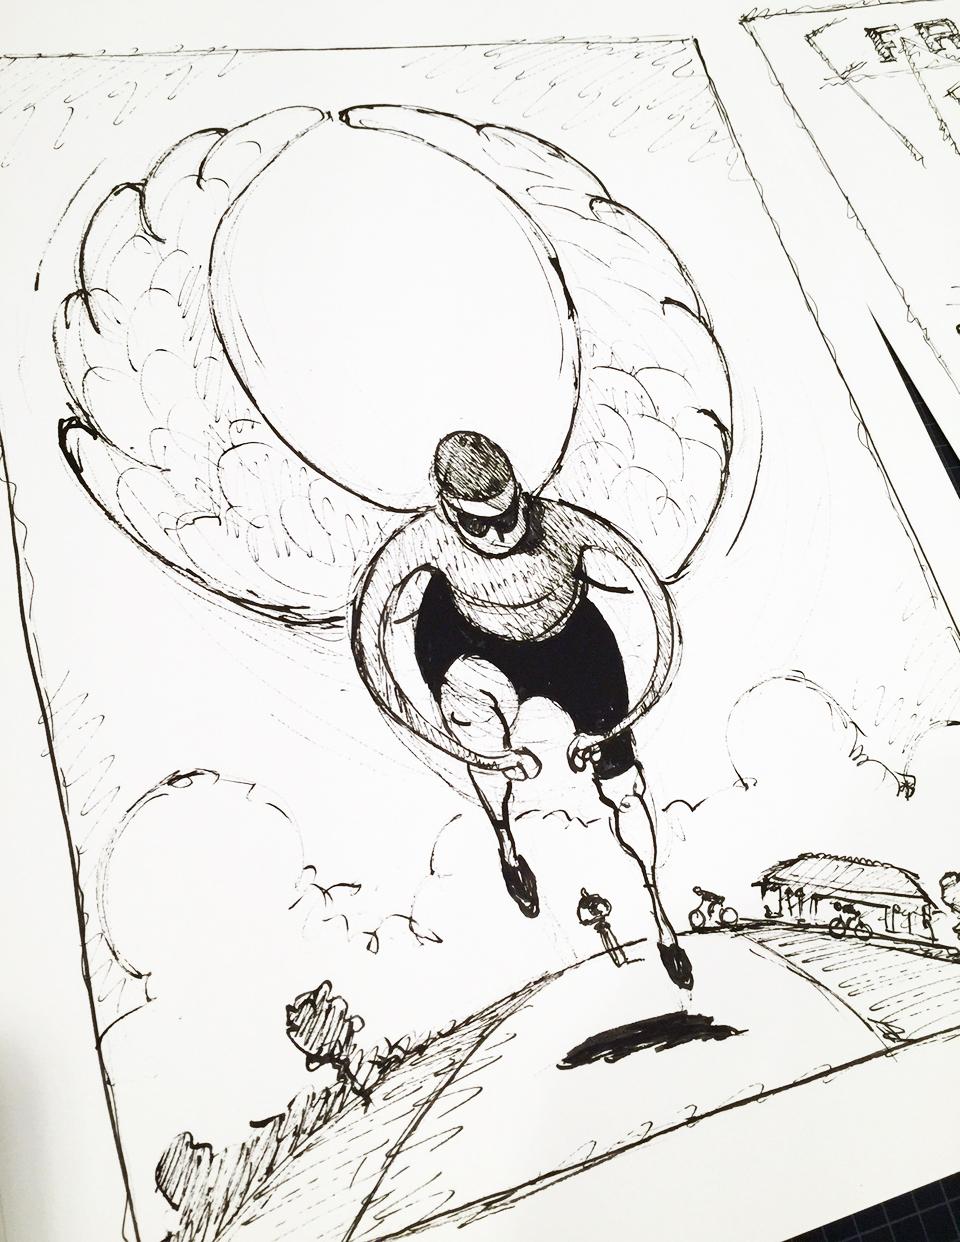 winged rider